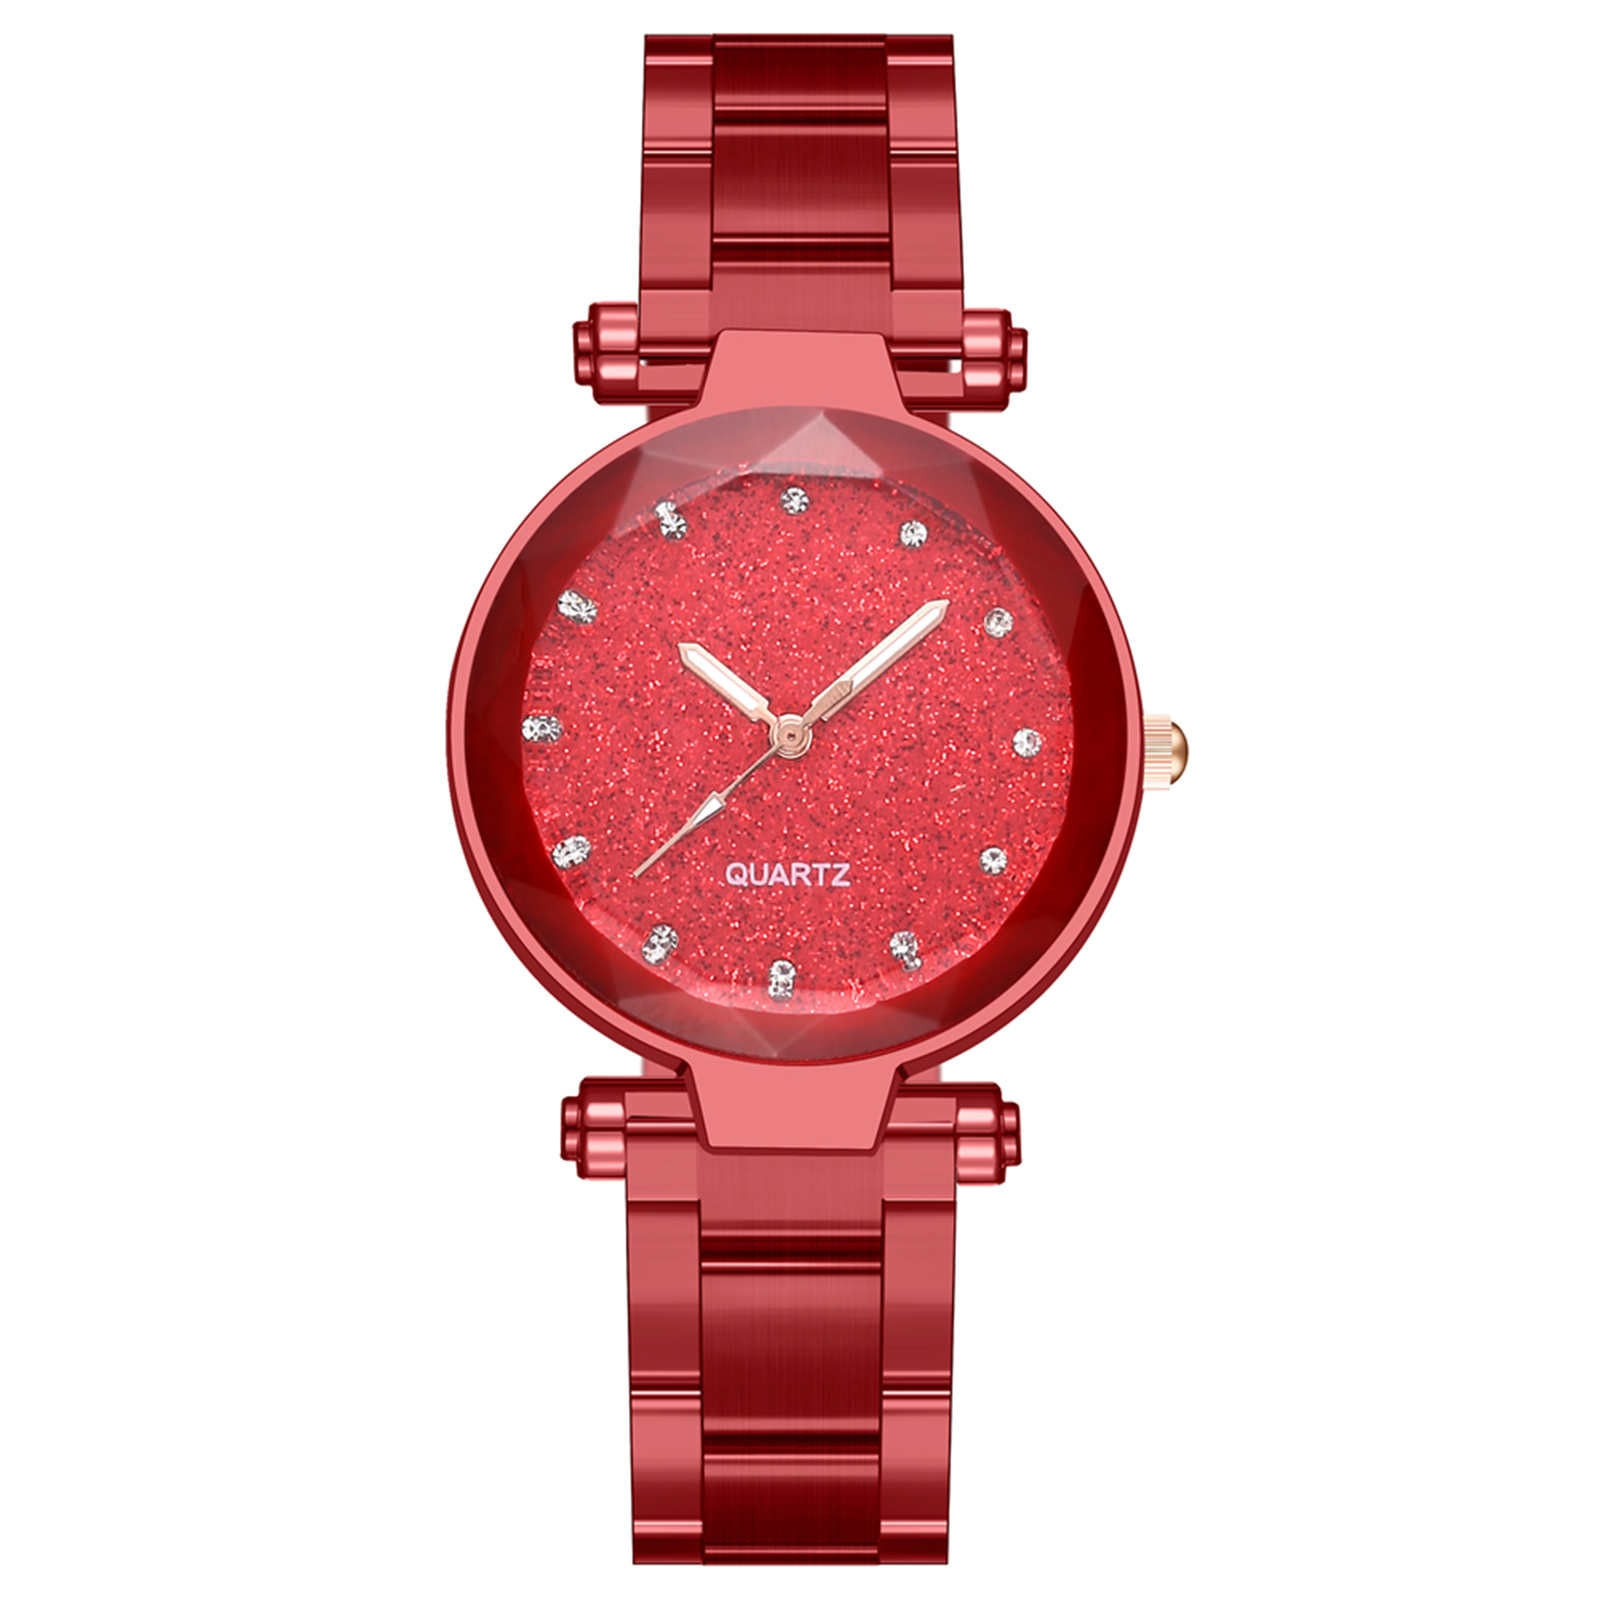 Quartz Watch Women Fashion Luxury Design Watches Ladies Stainless Steel Dial Casual Wristwatch zegarek damski relogios masculino